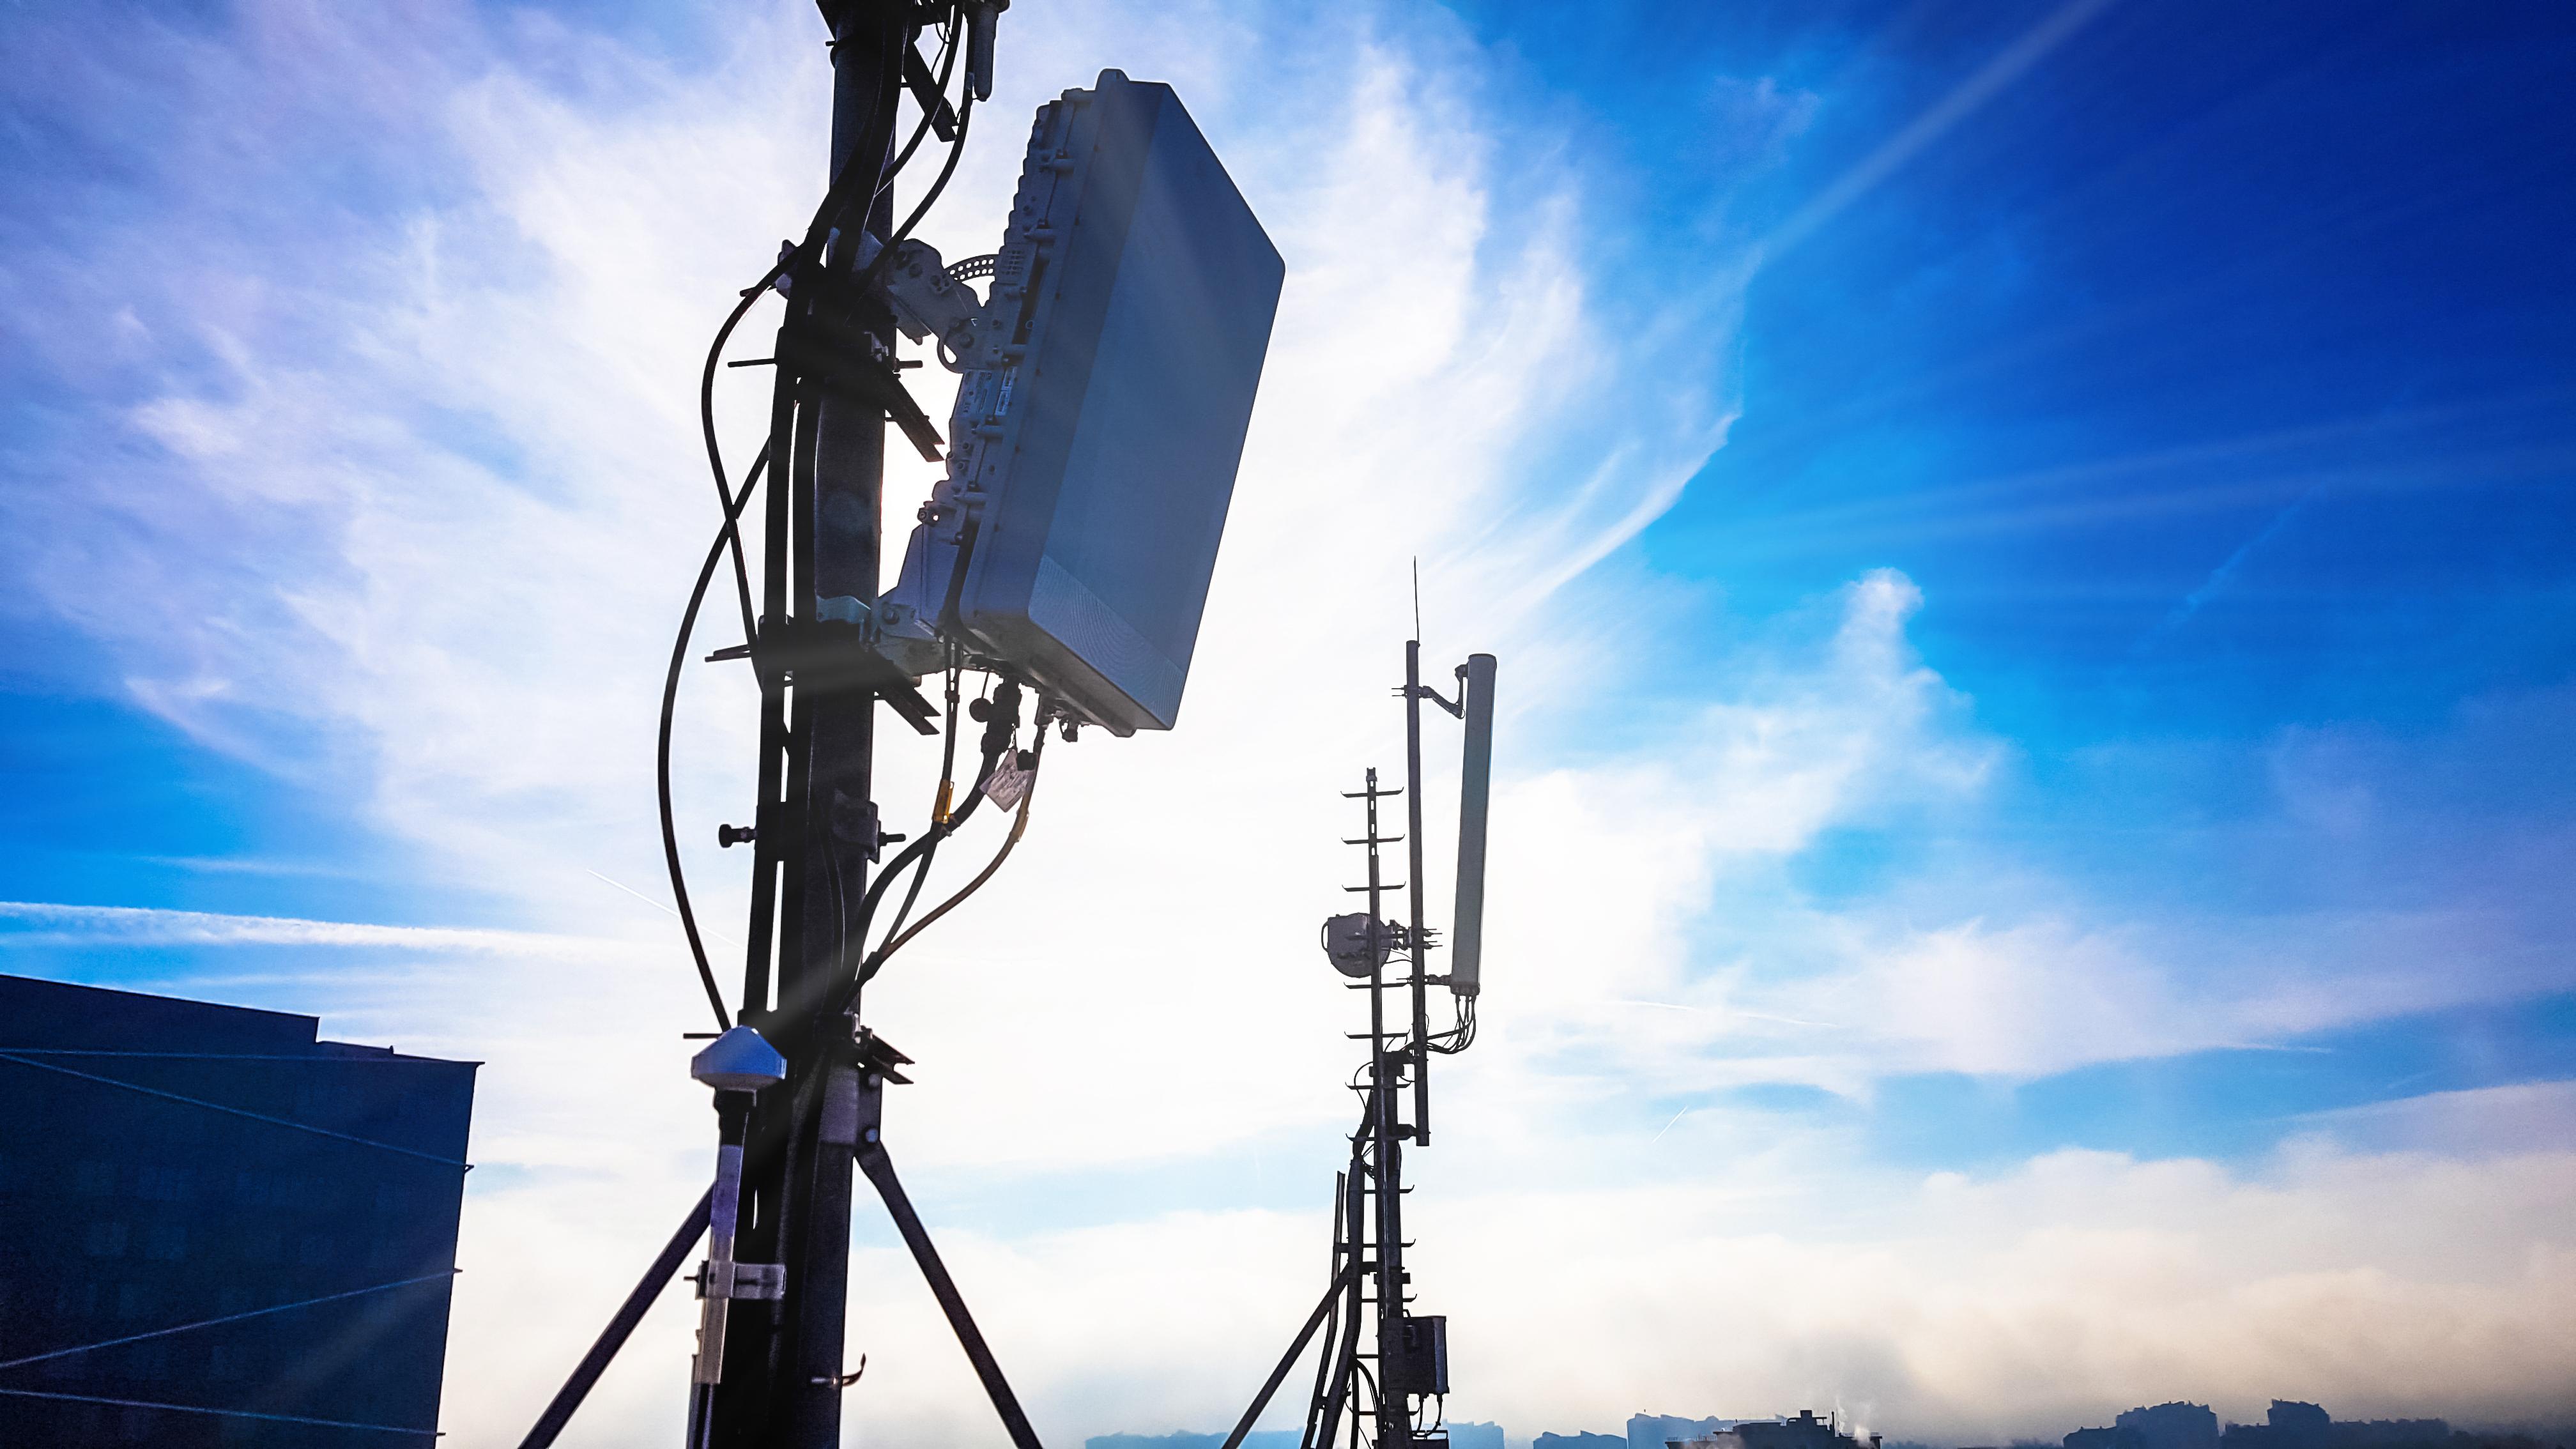 Il 5G fa male? Sfatiamo i falsi miti - PortNews